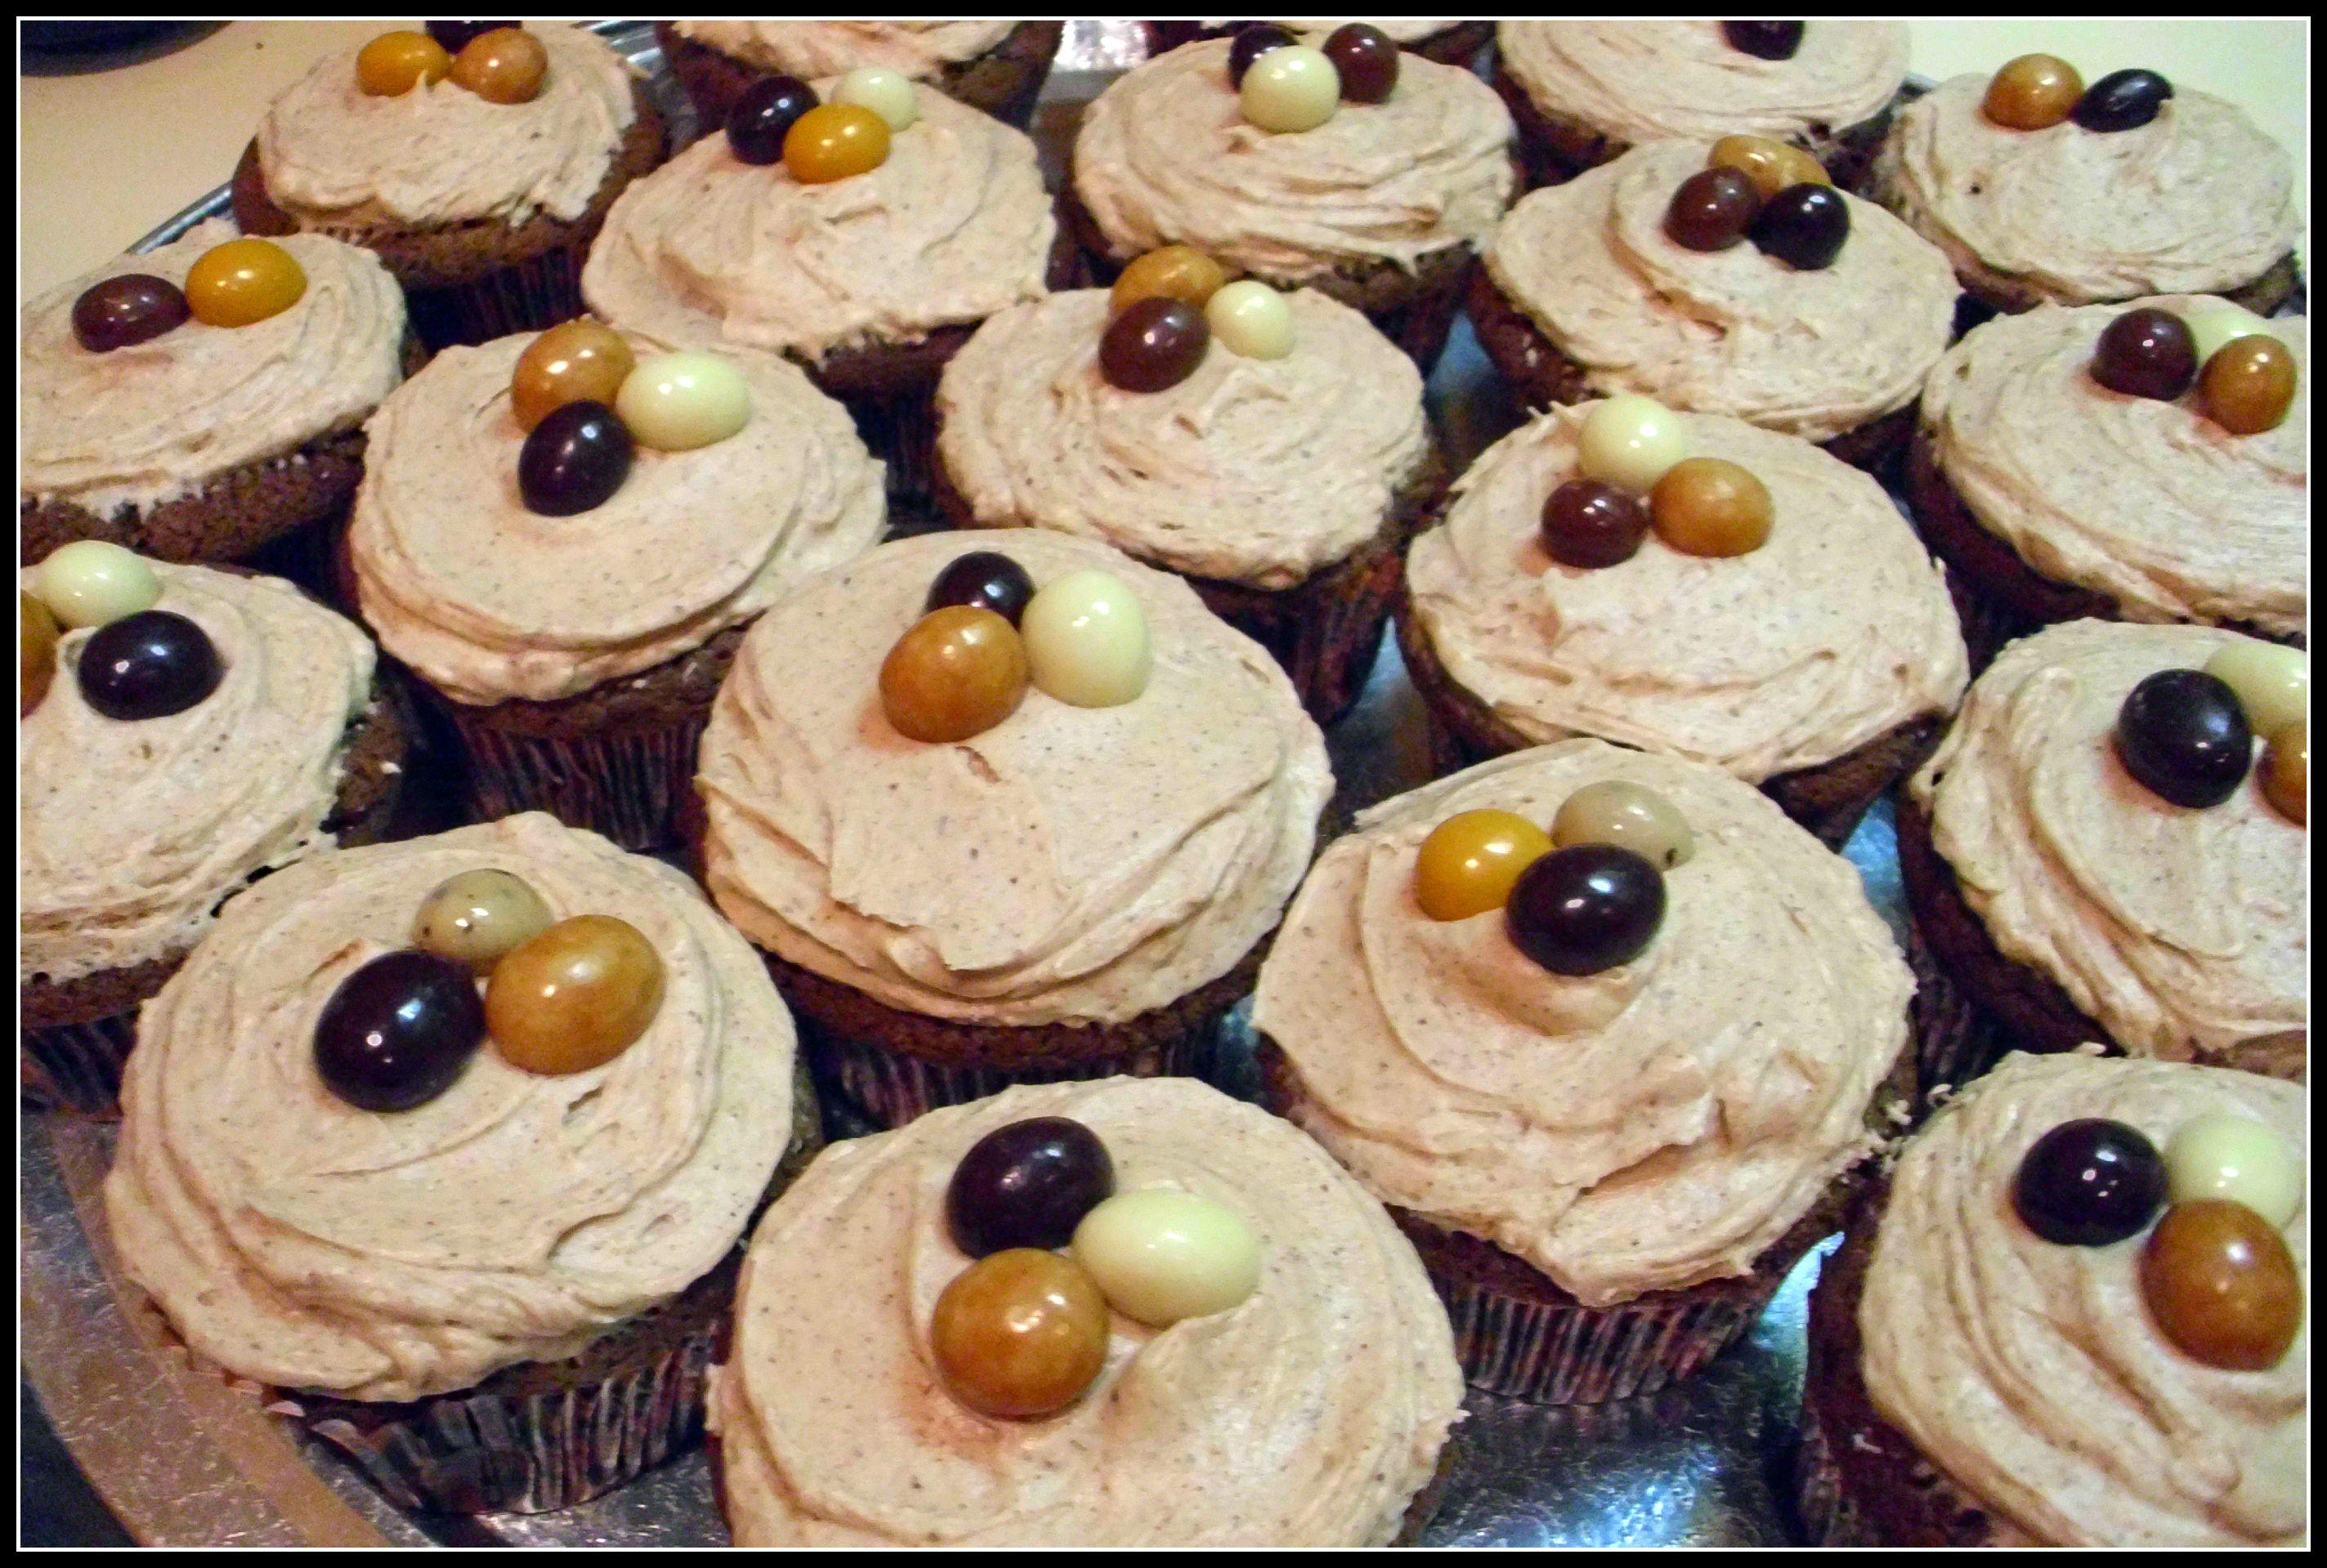 Gypsy World Spice Cafe Recipe – Spicy Mocha Cupcakes